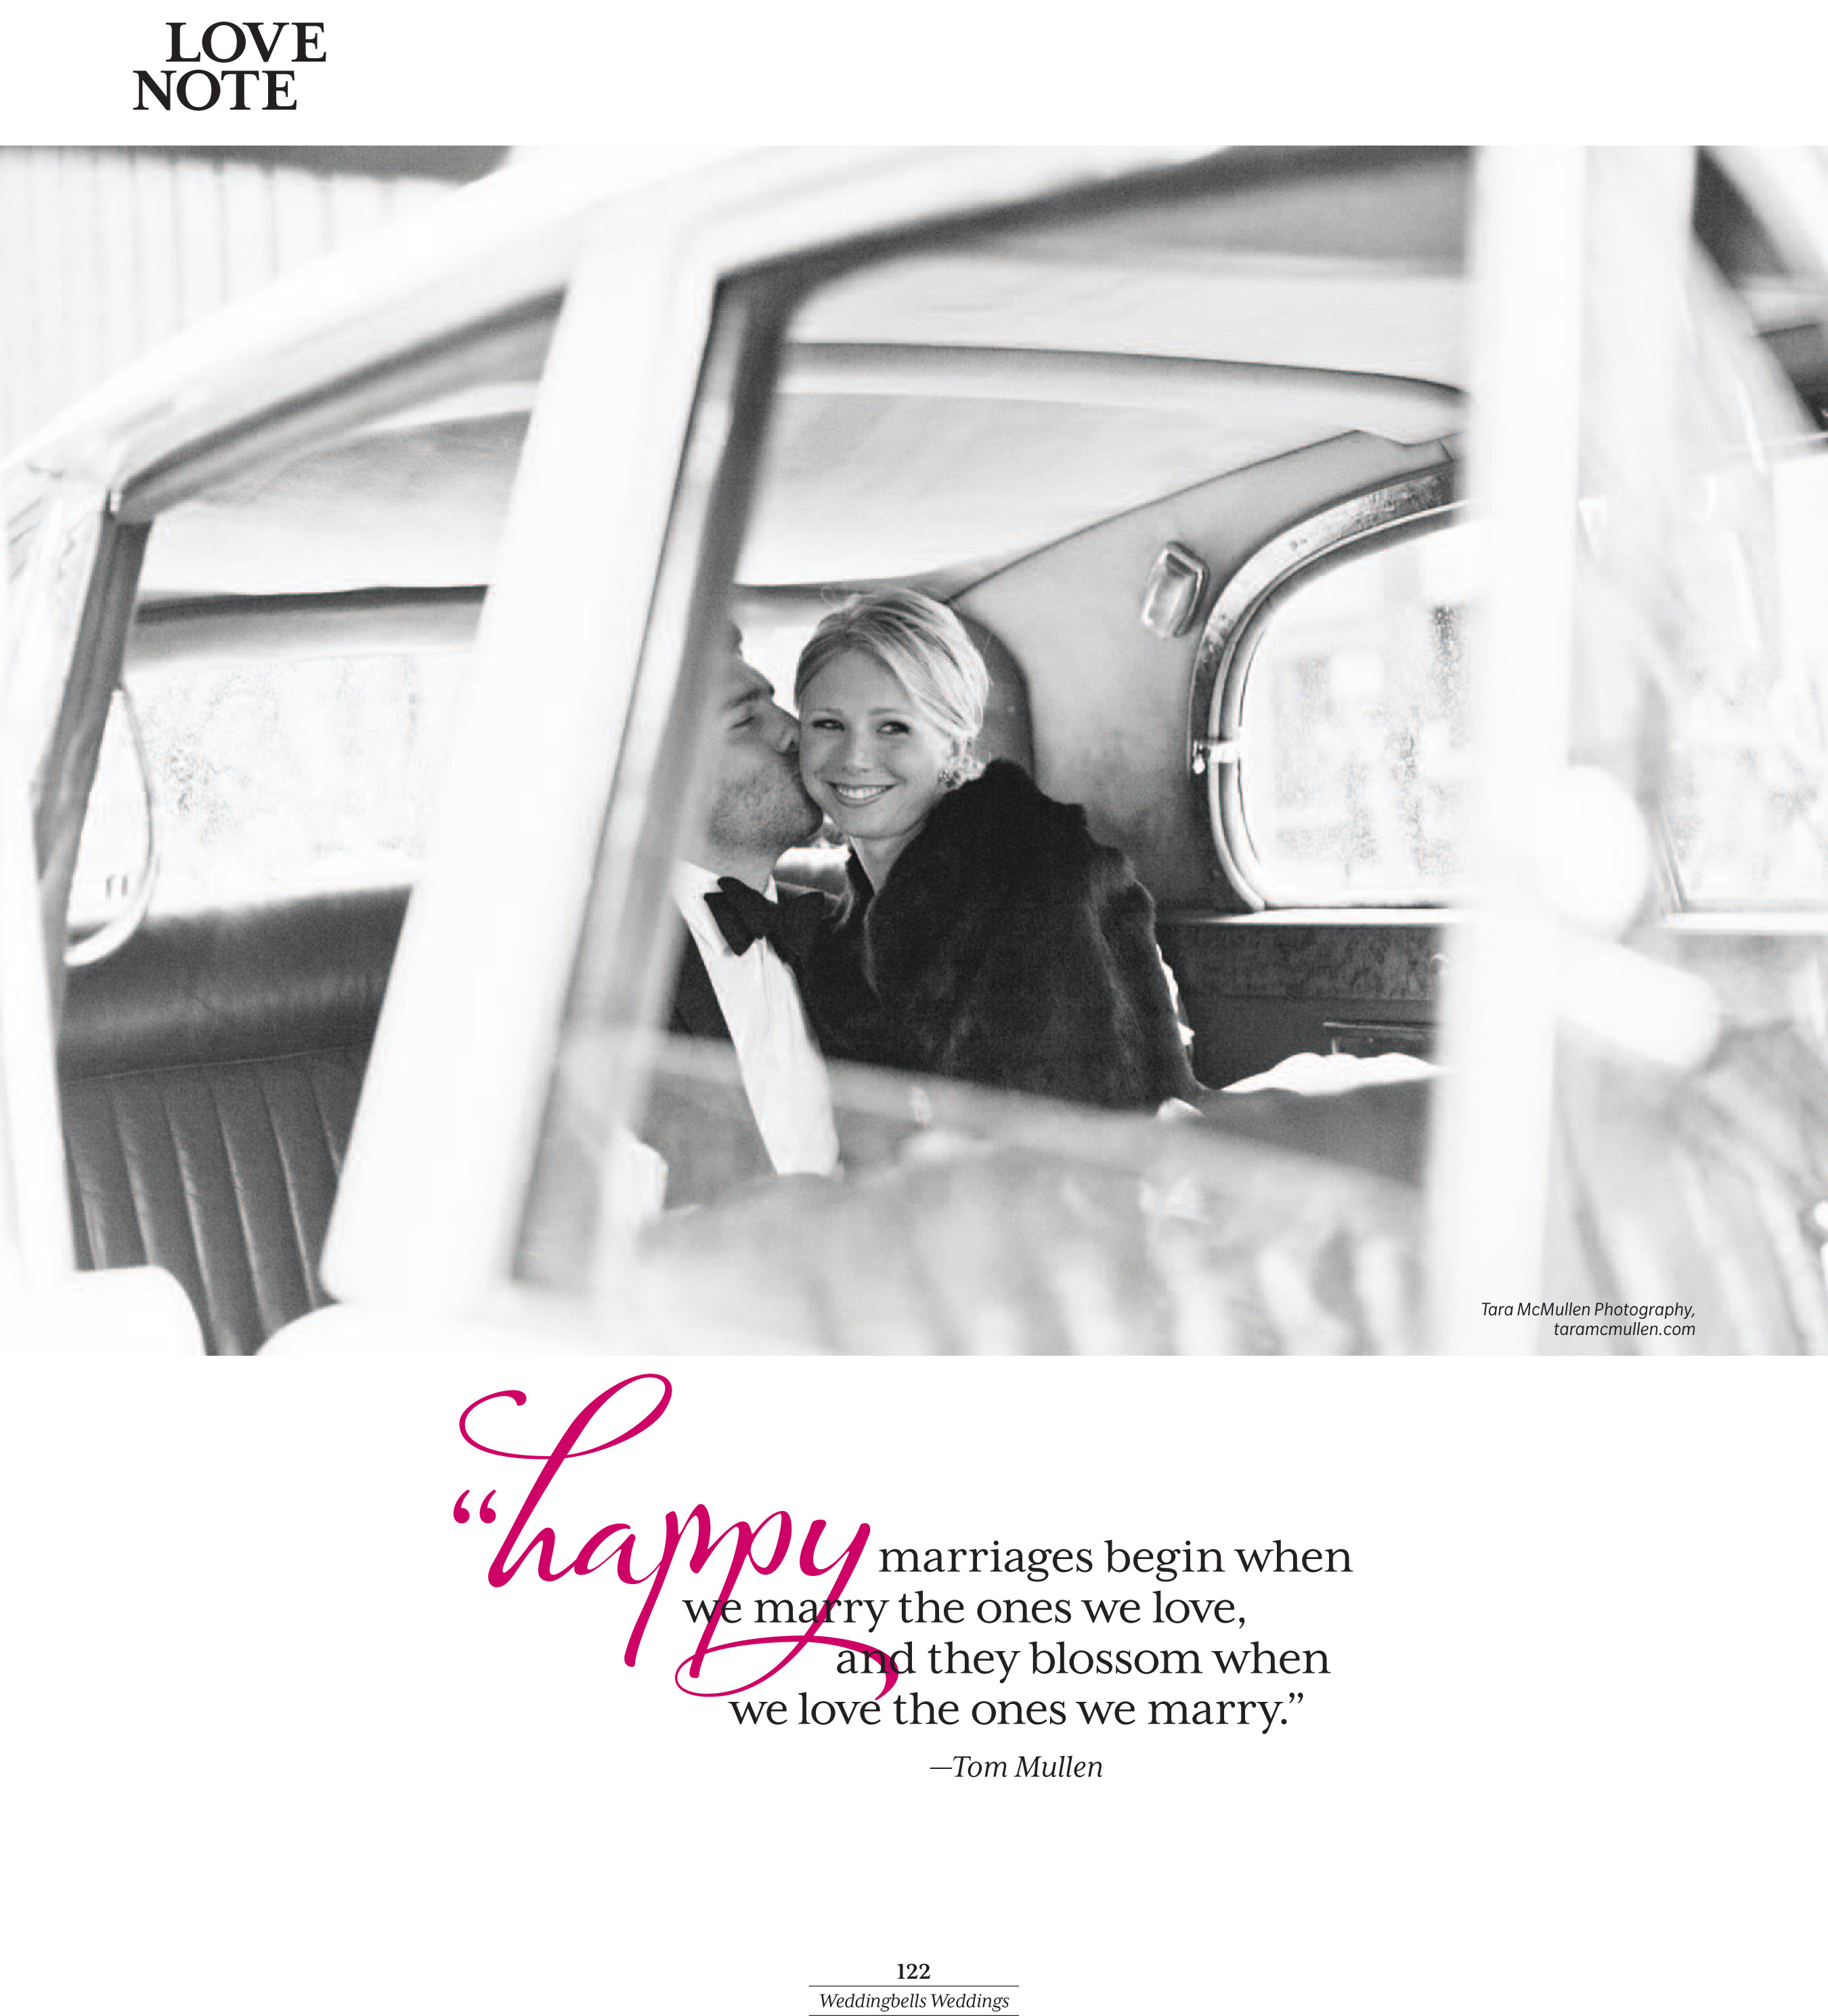 1tara-mcmullen-photography-weddingbells-magazine